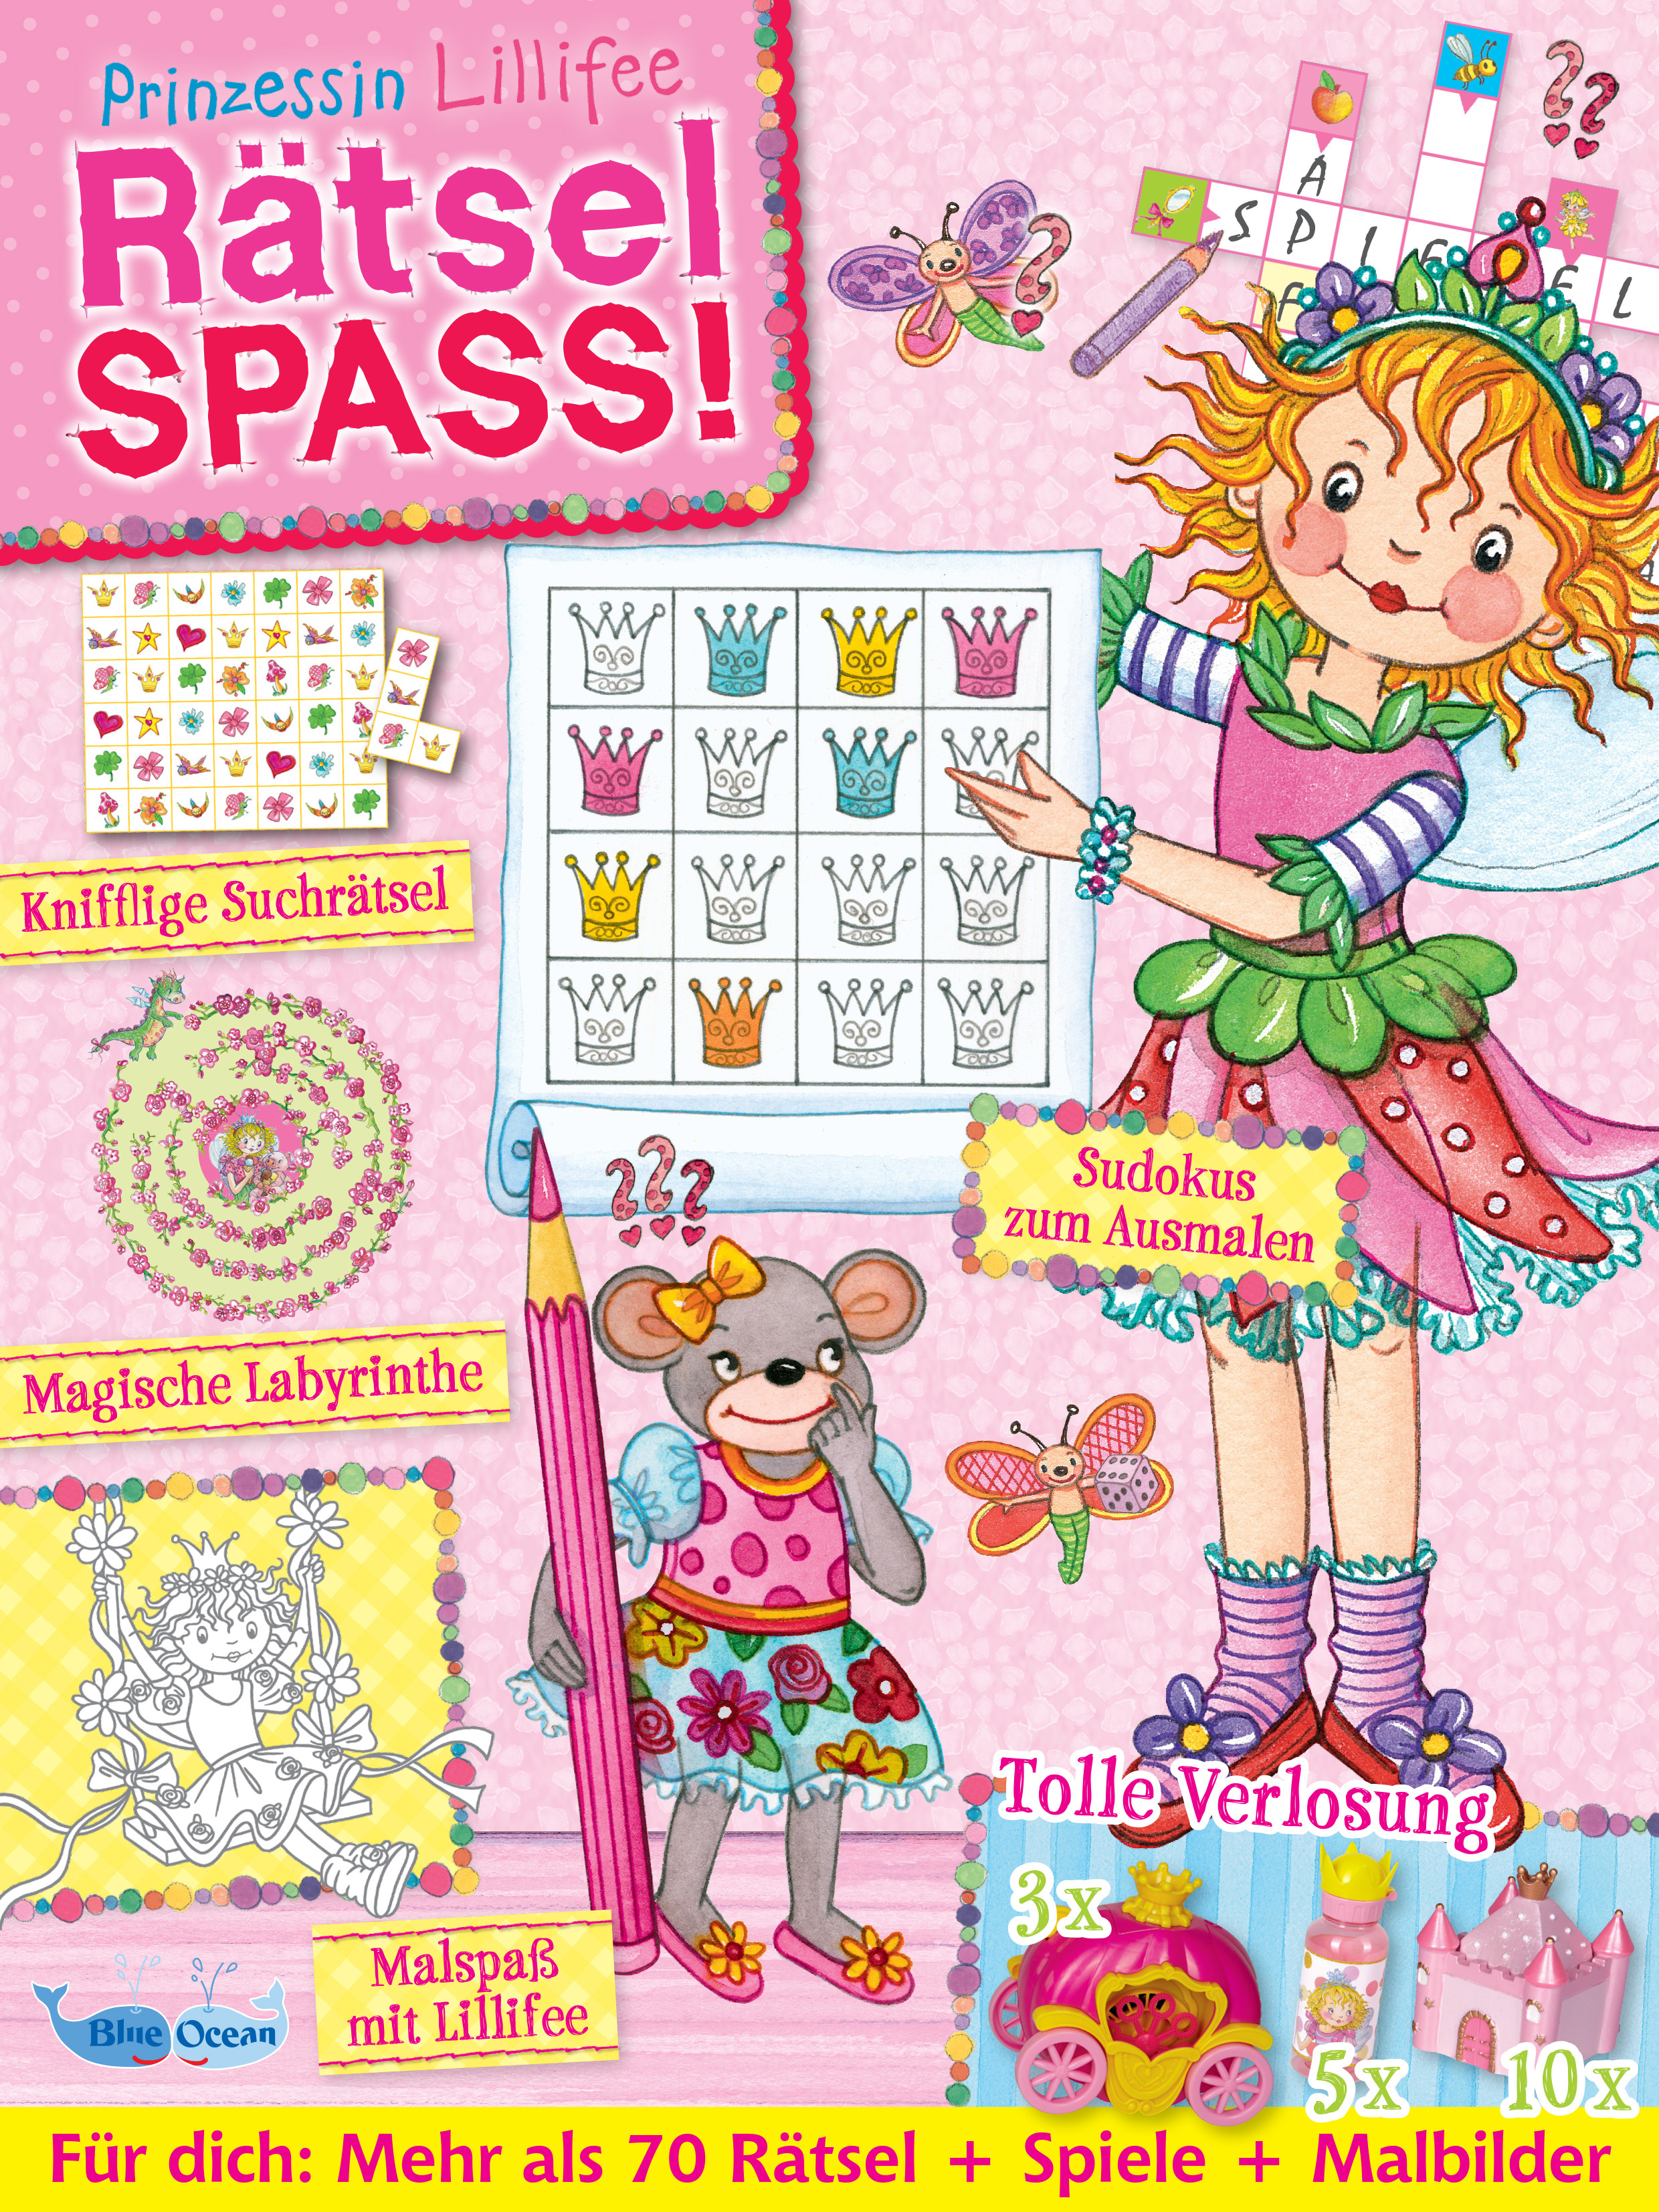 Ausmalbilder Prinzessin Prinzessin Lillifee Neu Prinzessin Lillifee Rätsel Spass 01 2018 Kvdd Sammlung